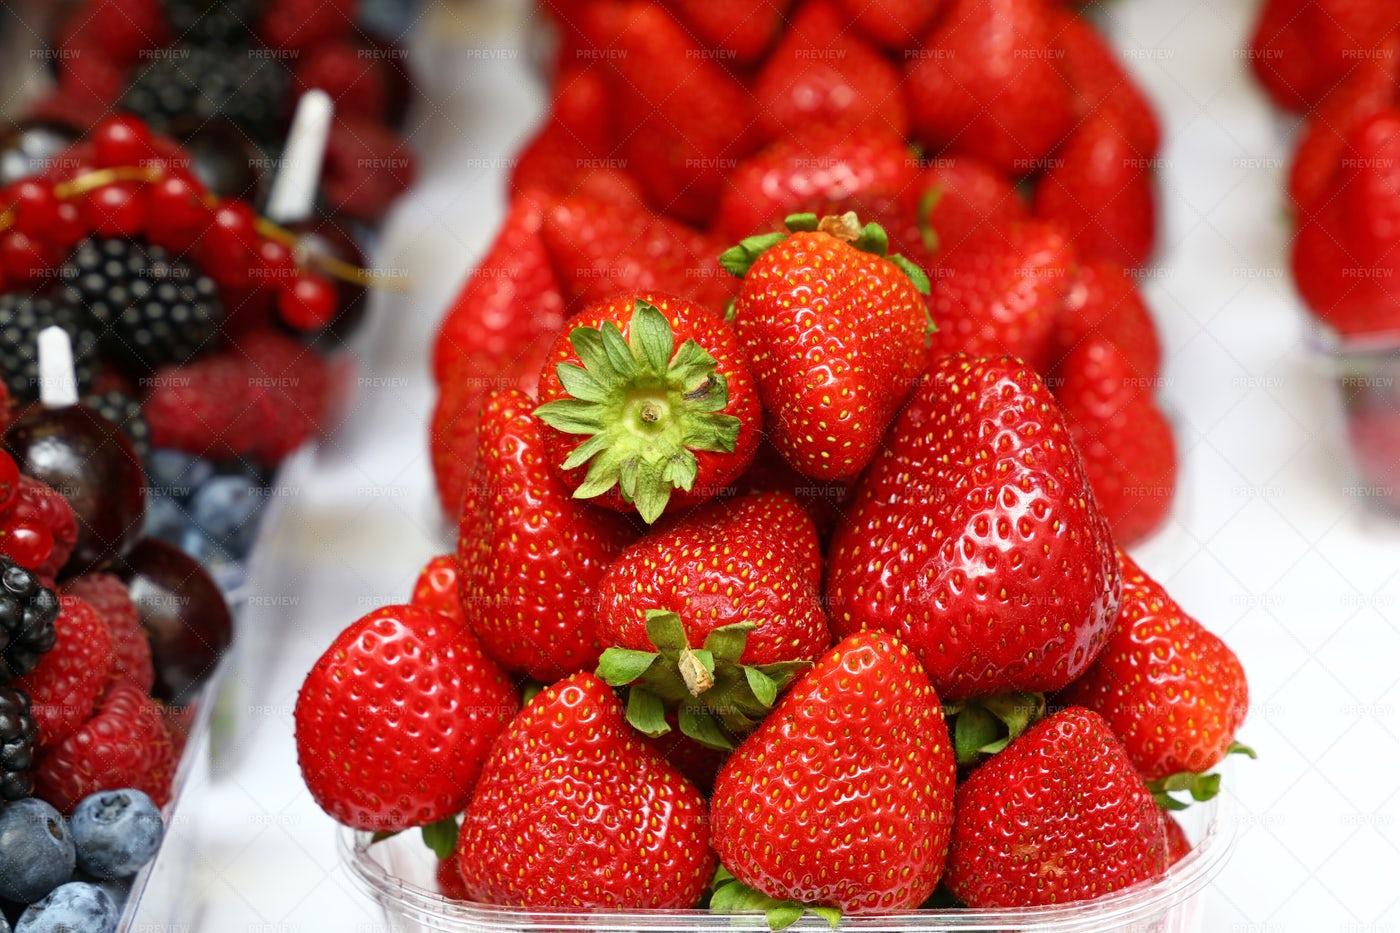 Big Pile Of Strawberries: Stock Photos